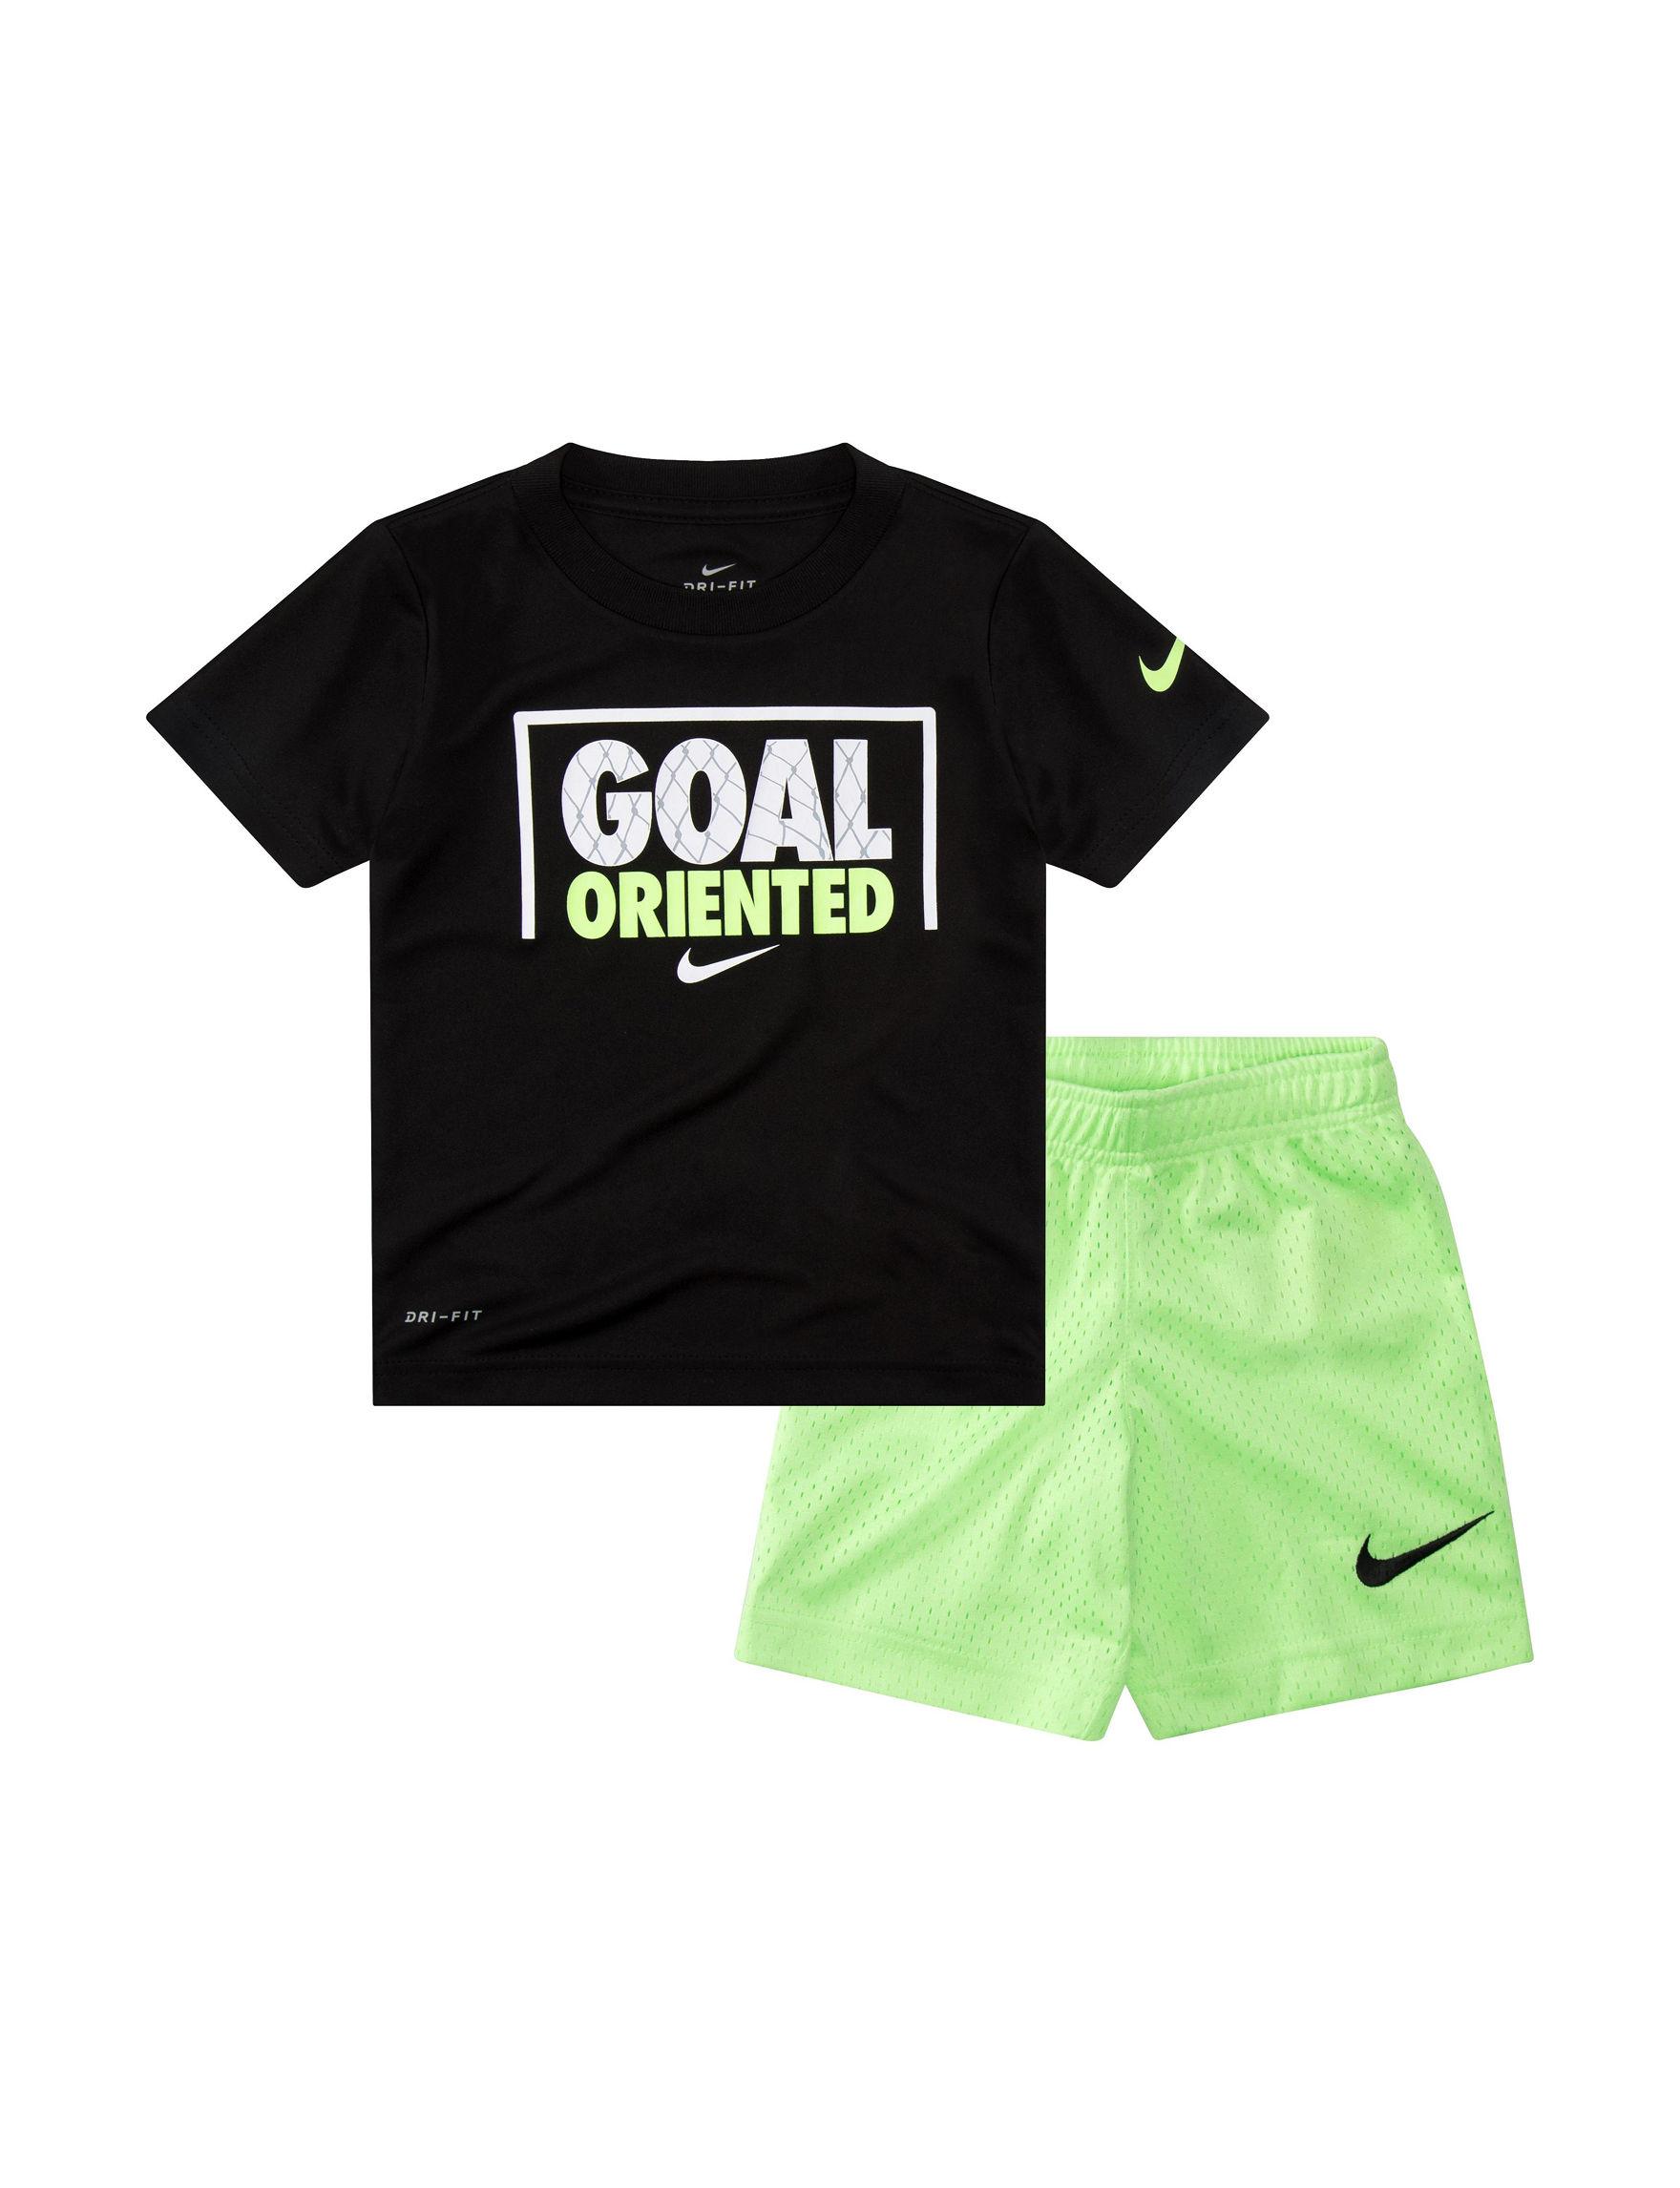 b642b7c9ca Nike 2-pc. Dri-FIT Goal Oriented T-shirt & Shorts Set - Toddler Boys ...